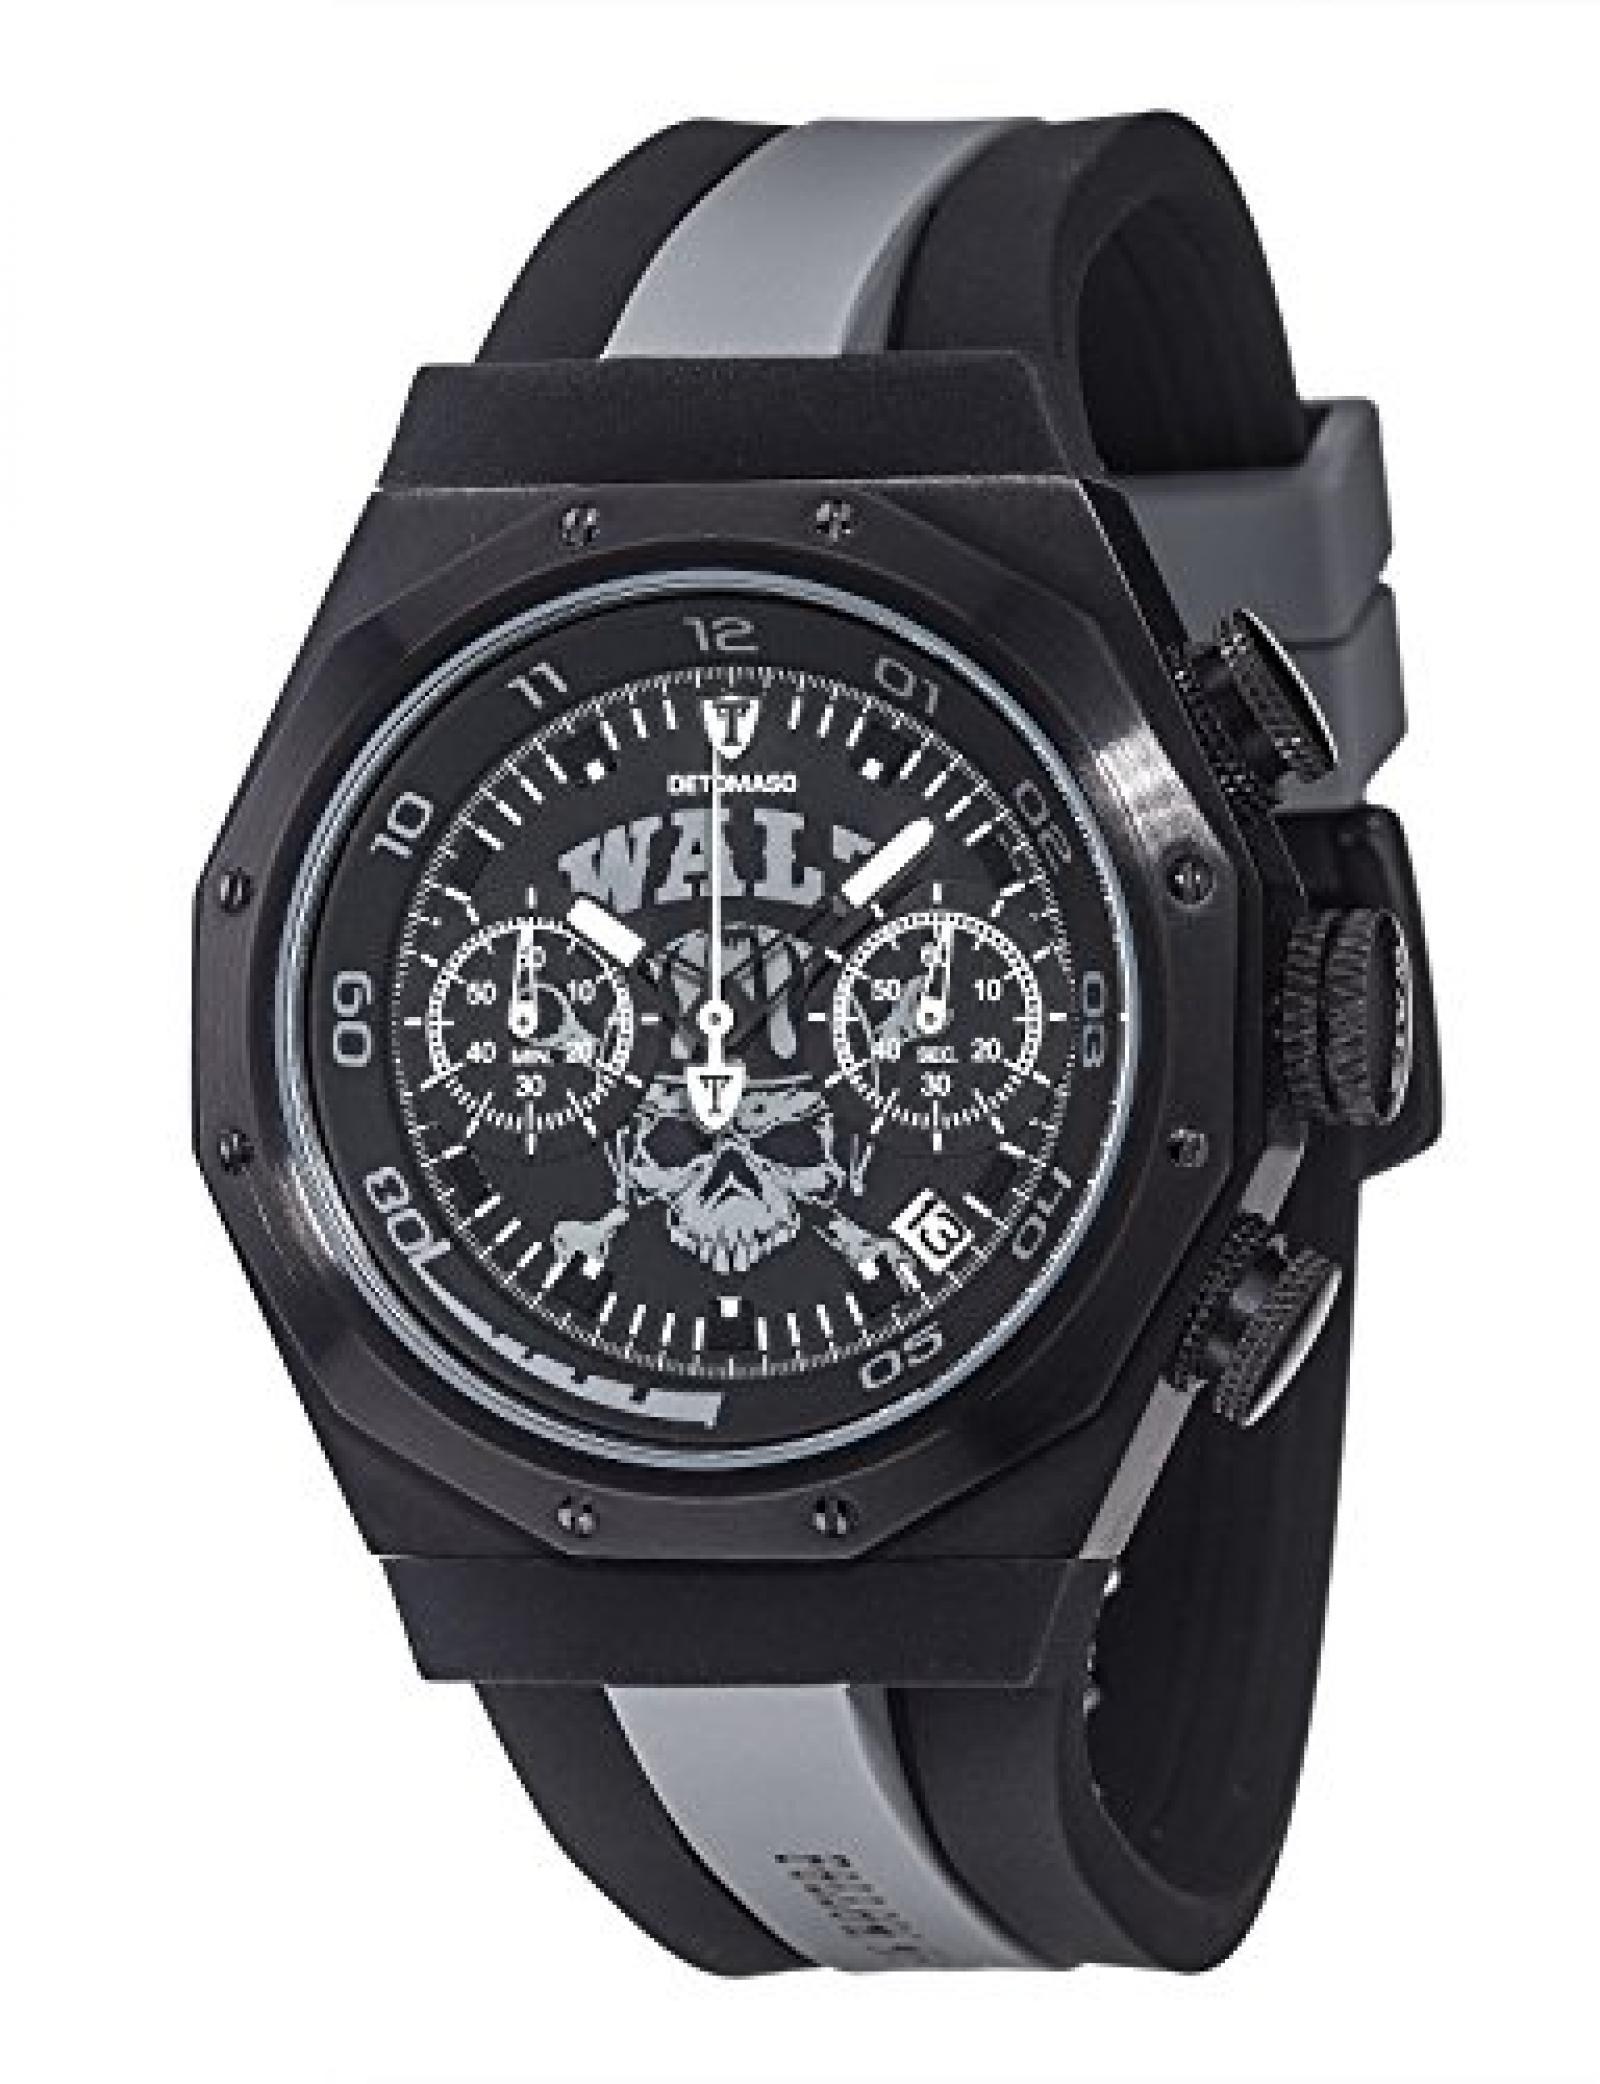 Detomaso Herren-Armbanduhr WALZ Edition ADRENALINE Grey Trend Chronograph Quarz Silikon DT-W1003-D